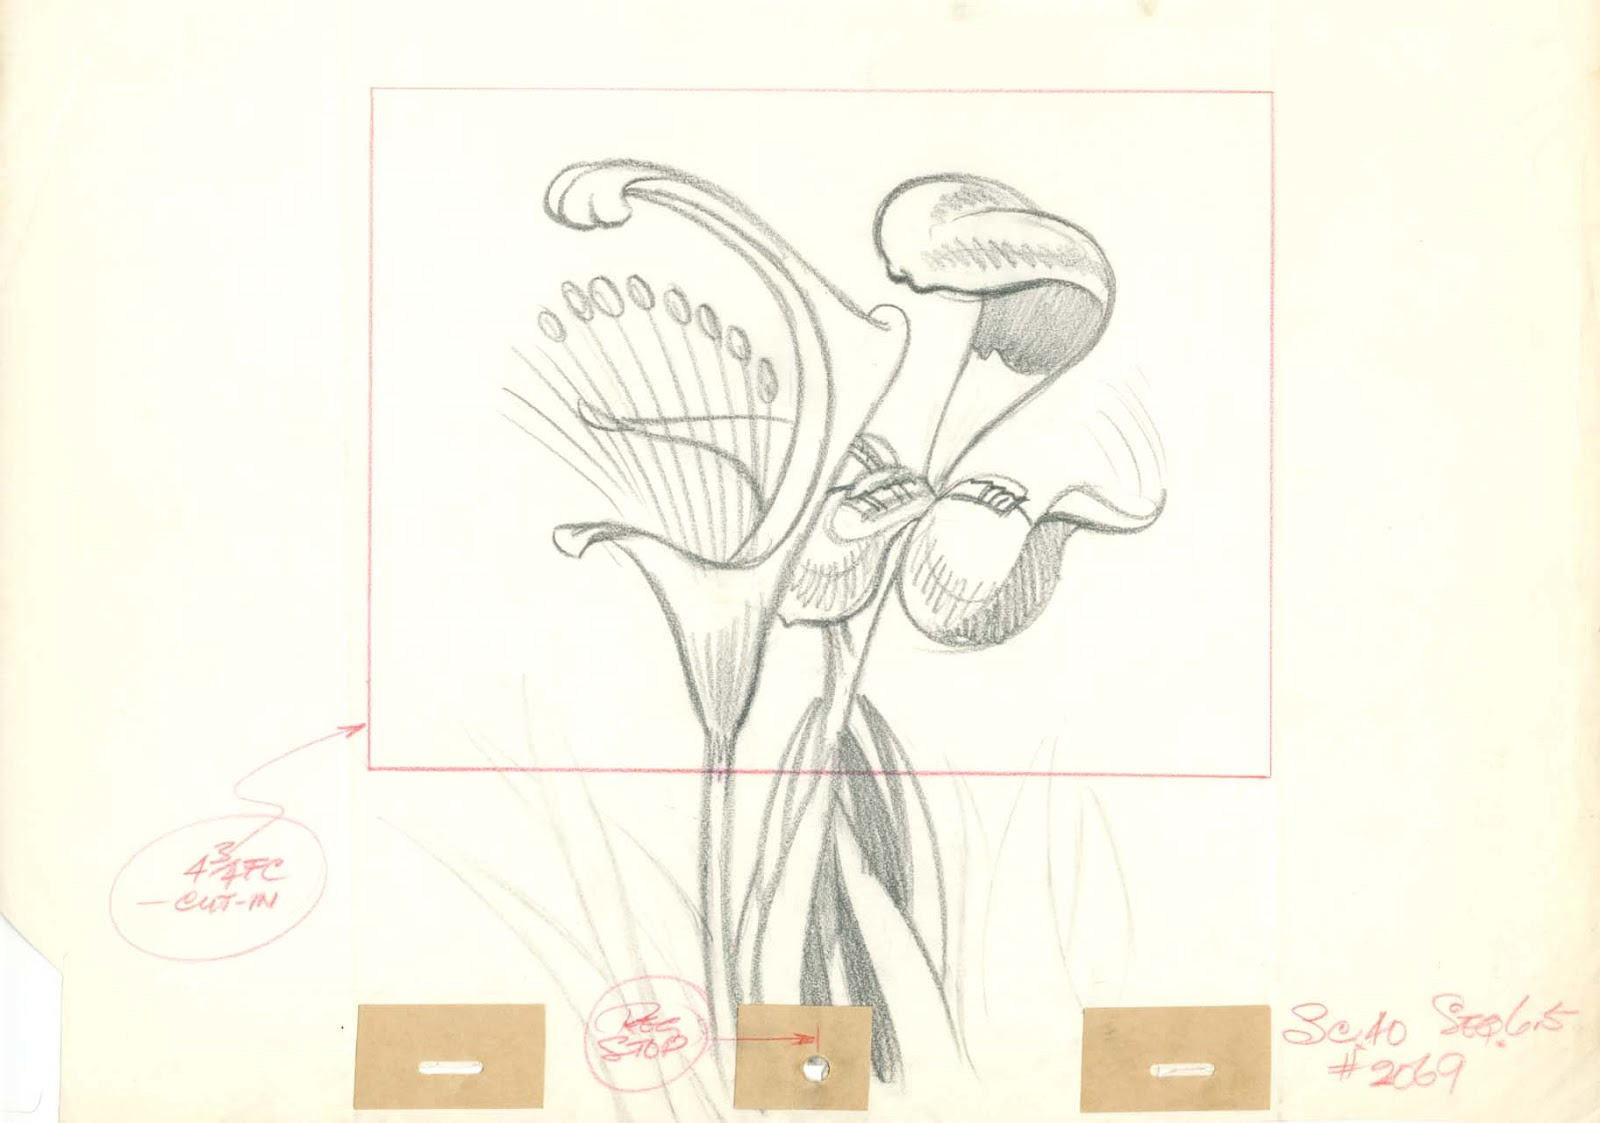 Image 16 Field Drawing Iris Playing Harp Layout Drawing Blogg